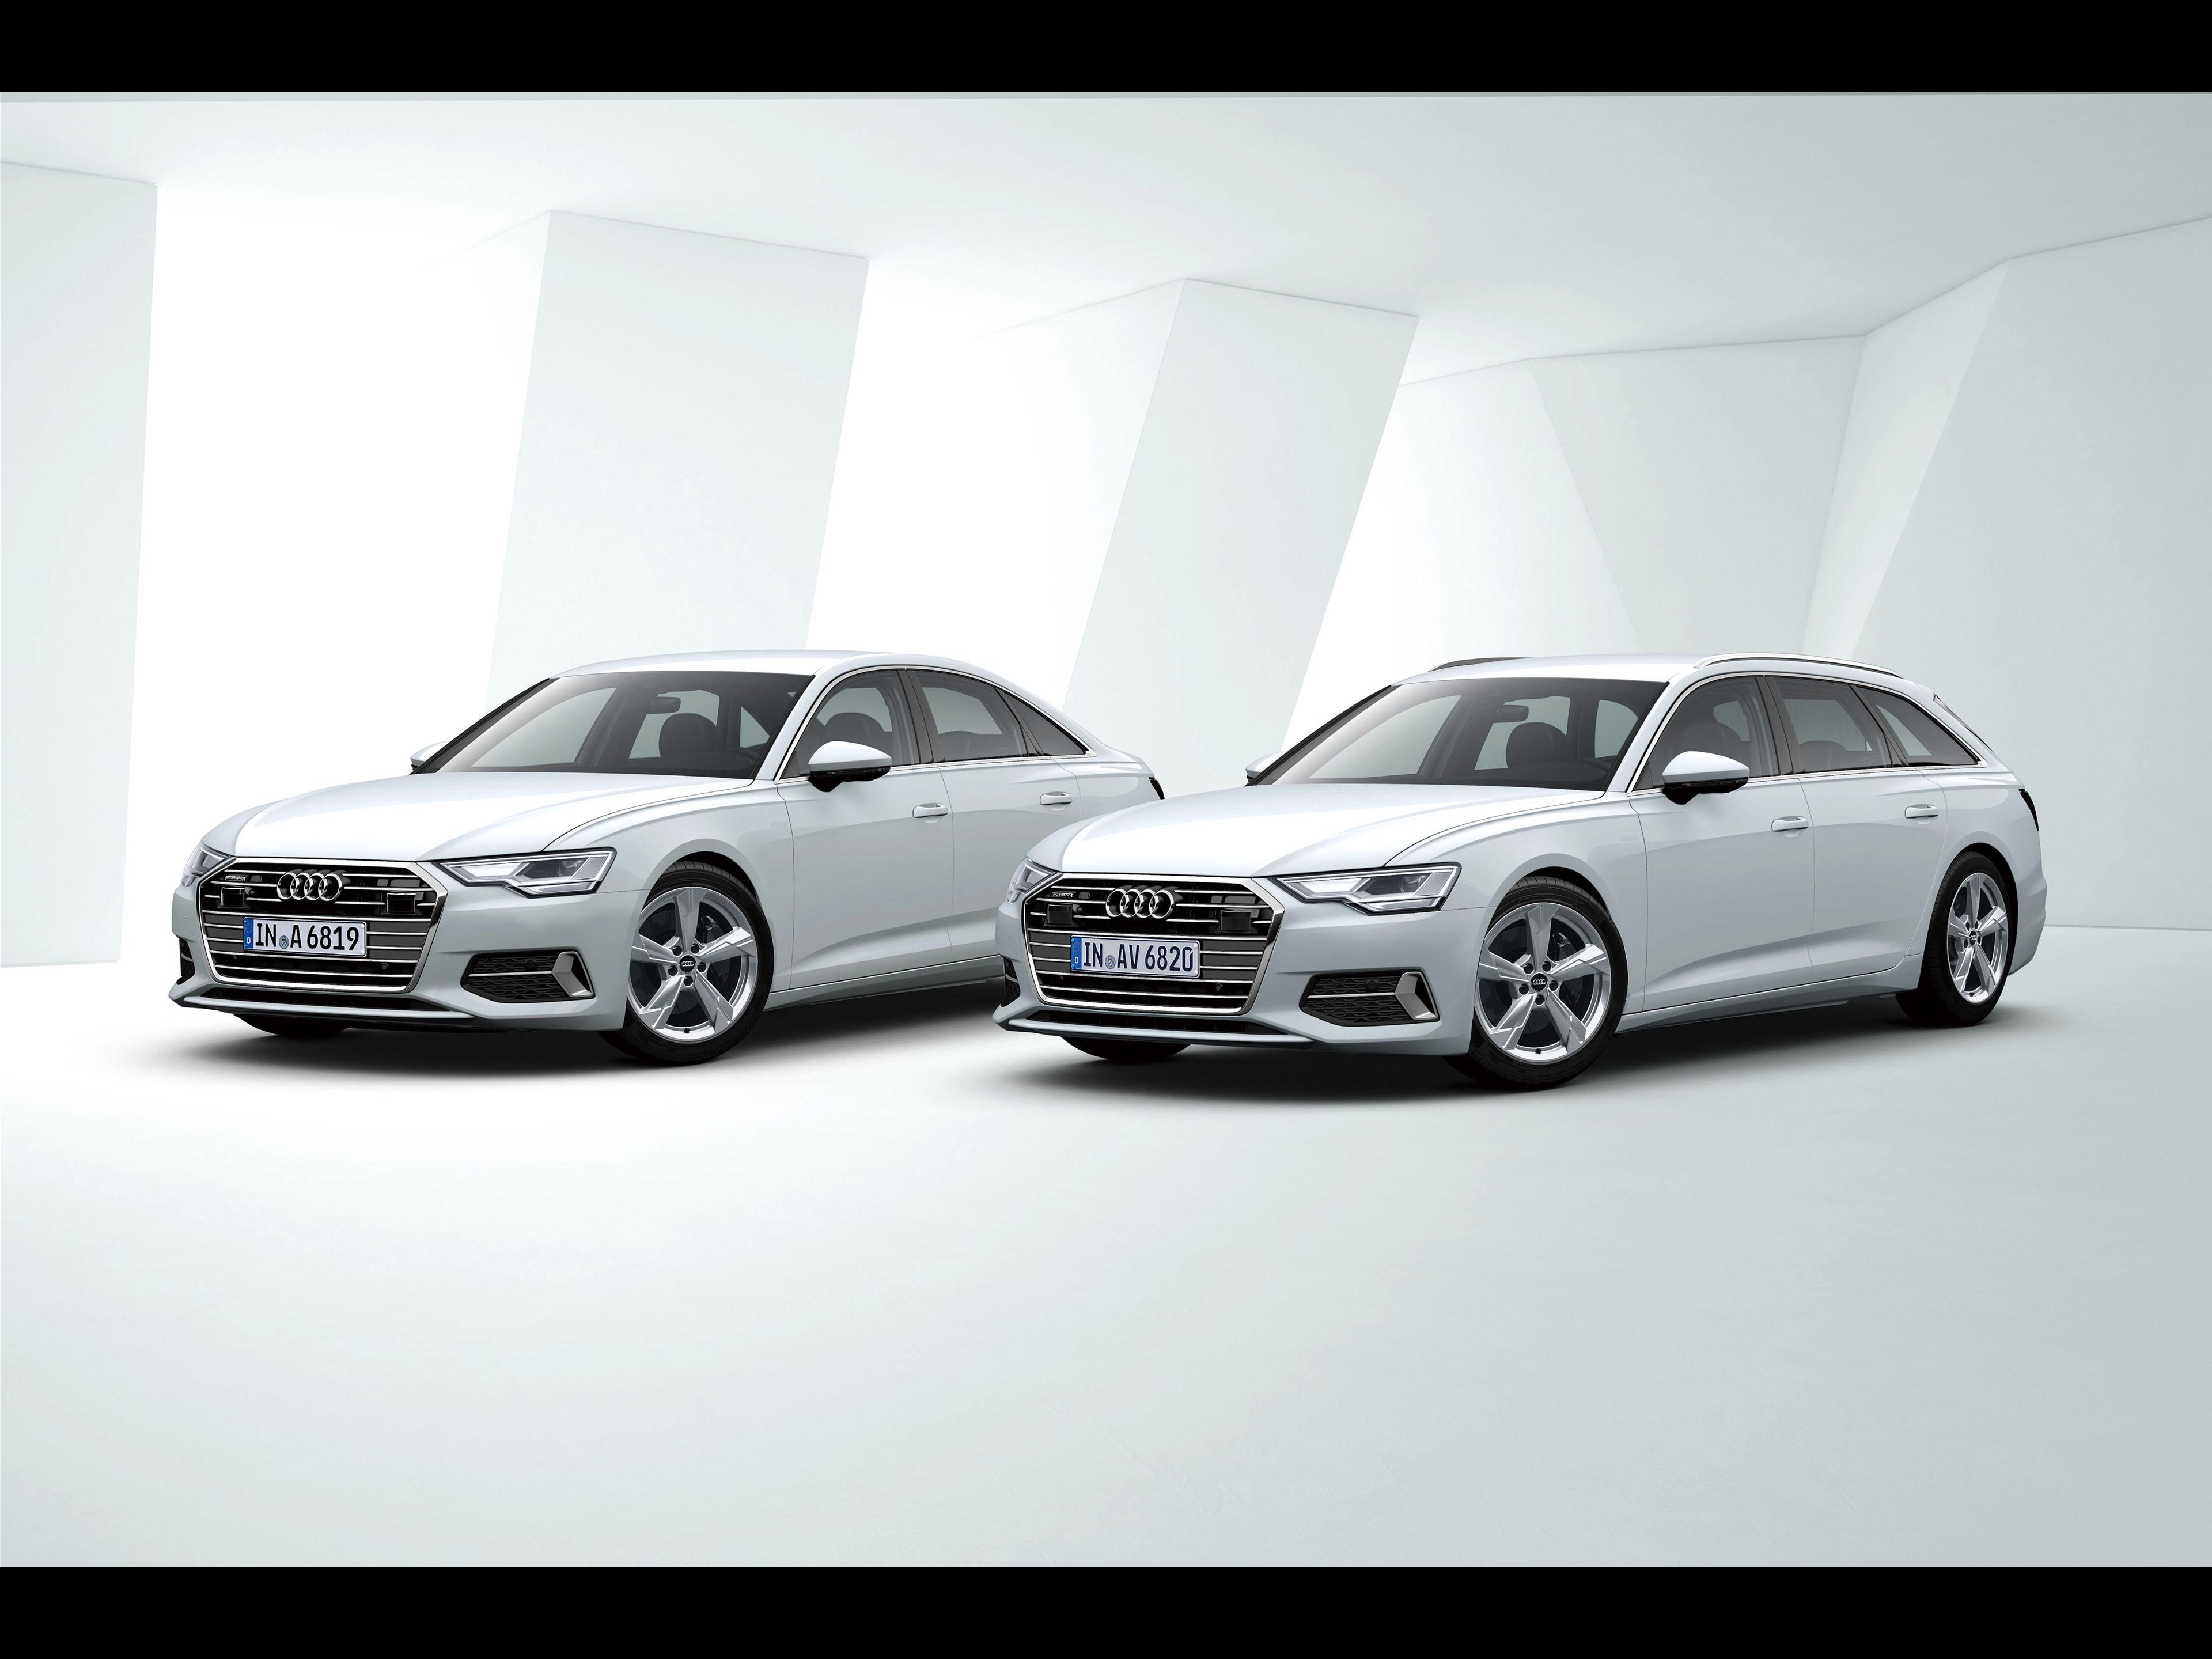 Audi A6 45 Tfsi Quattro Sport 2020 アウディに嵌まる 壁紙画像